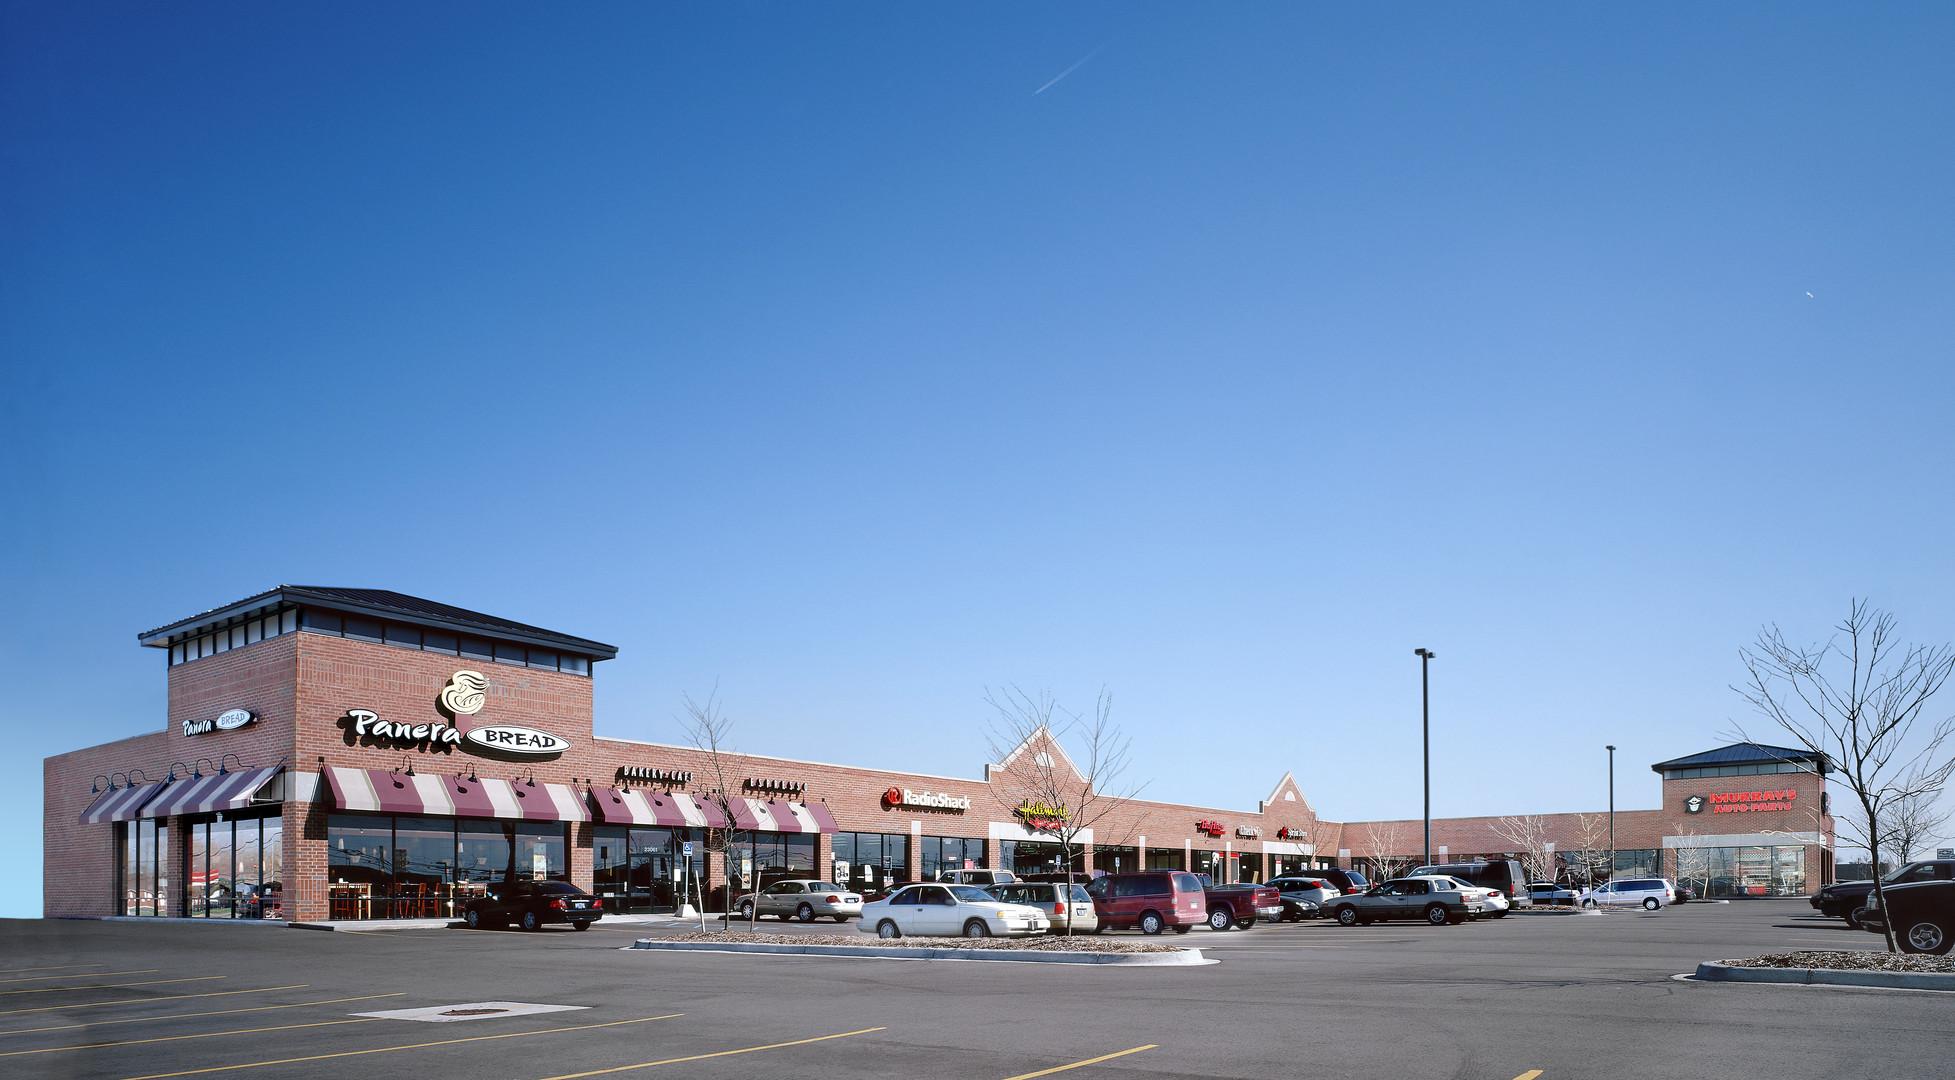 West Allen Plaza